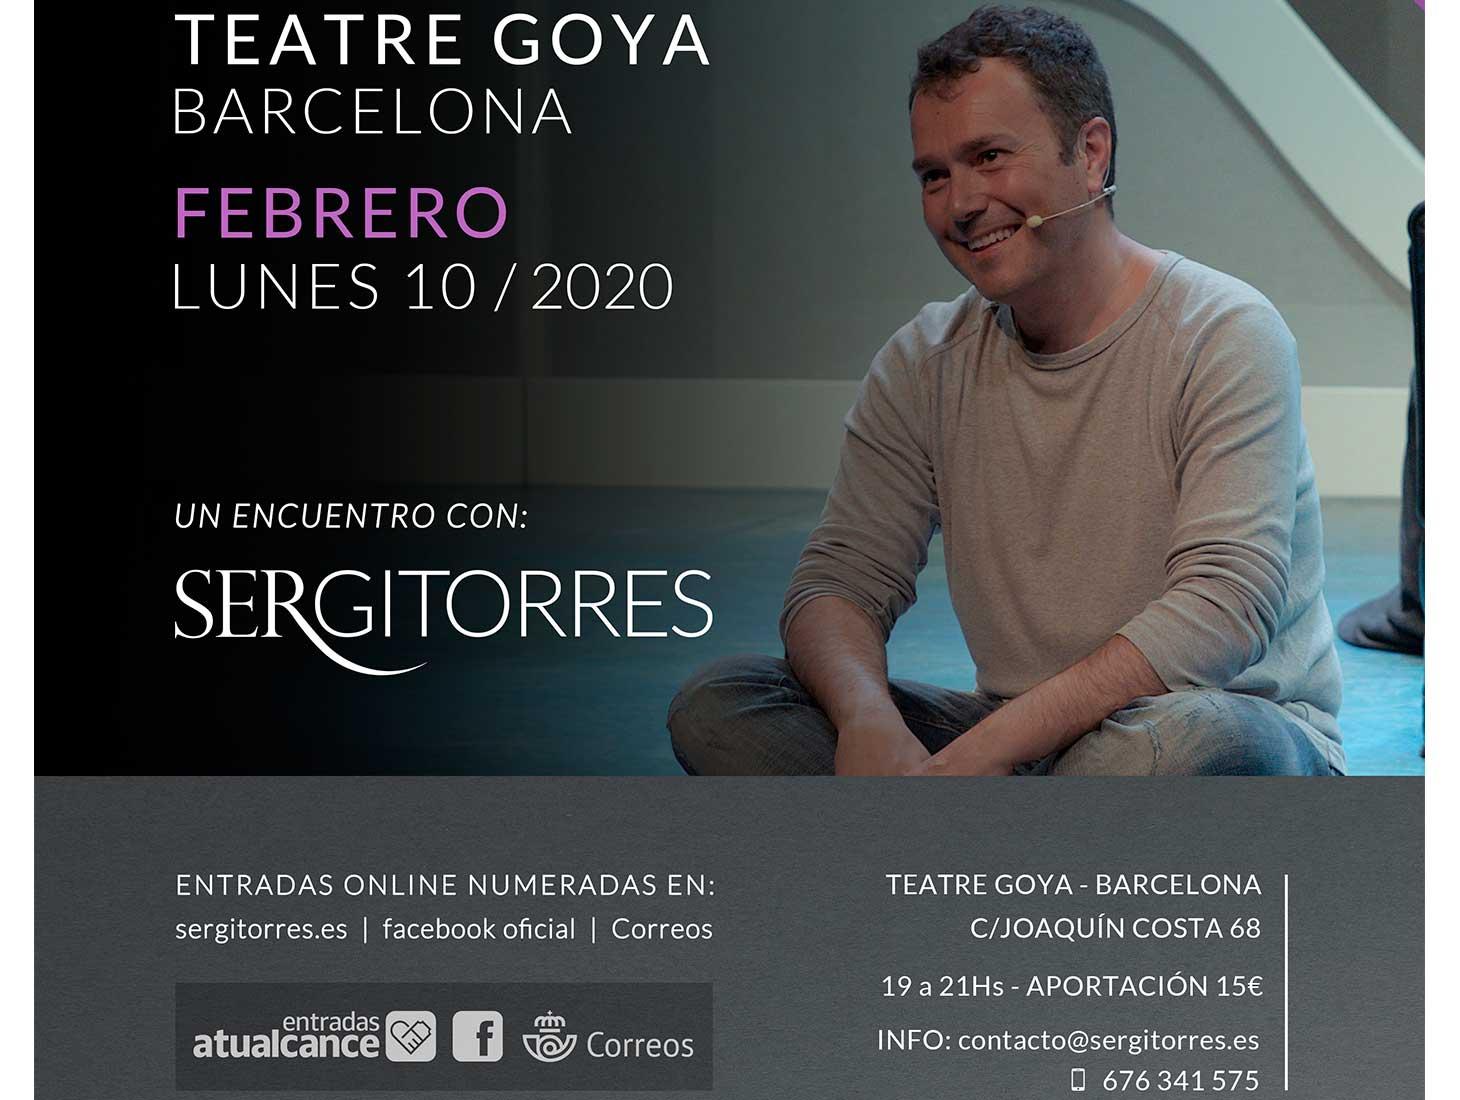 encuentro-con-sergi-torres-en-teatre-goya-barcelona-10-febrero-2-5dc955852af41.jpeg